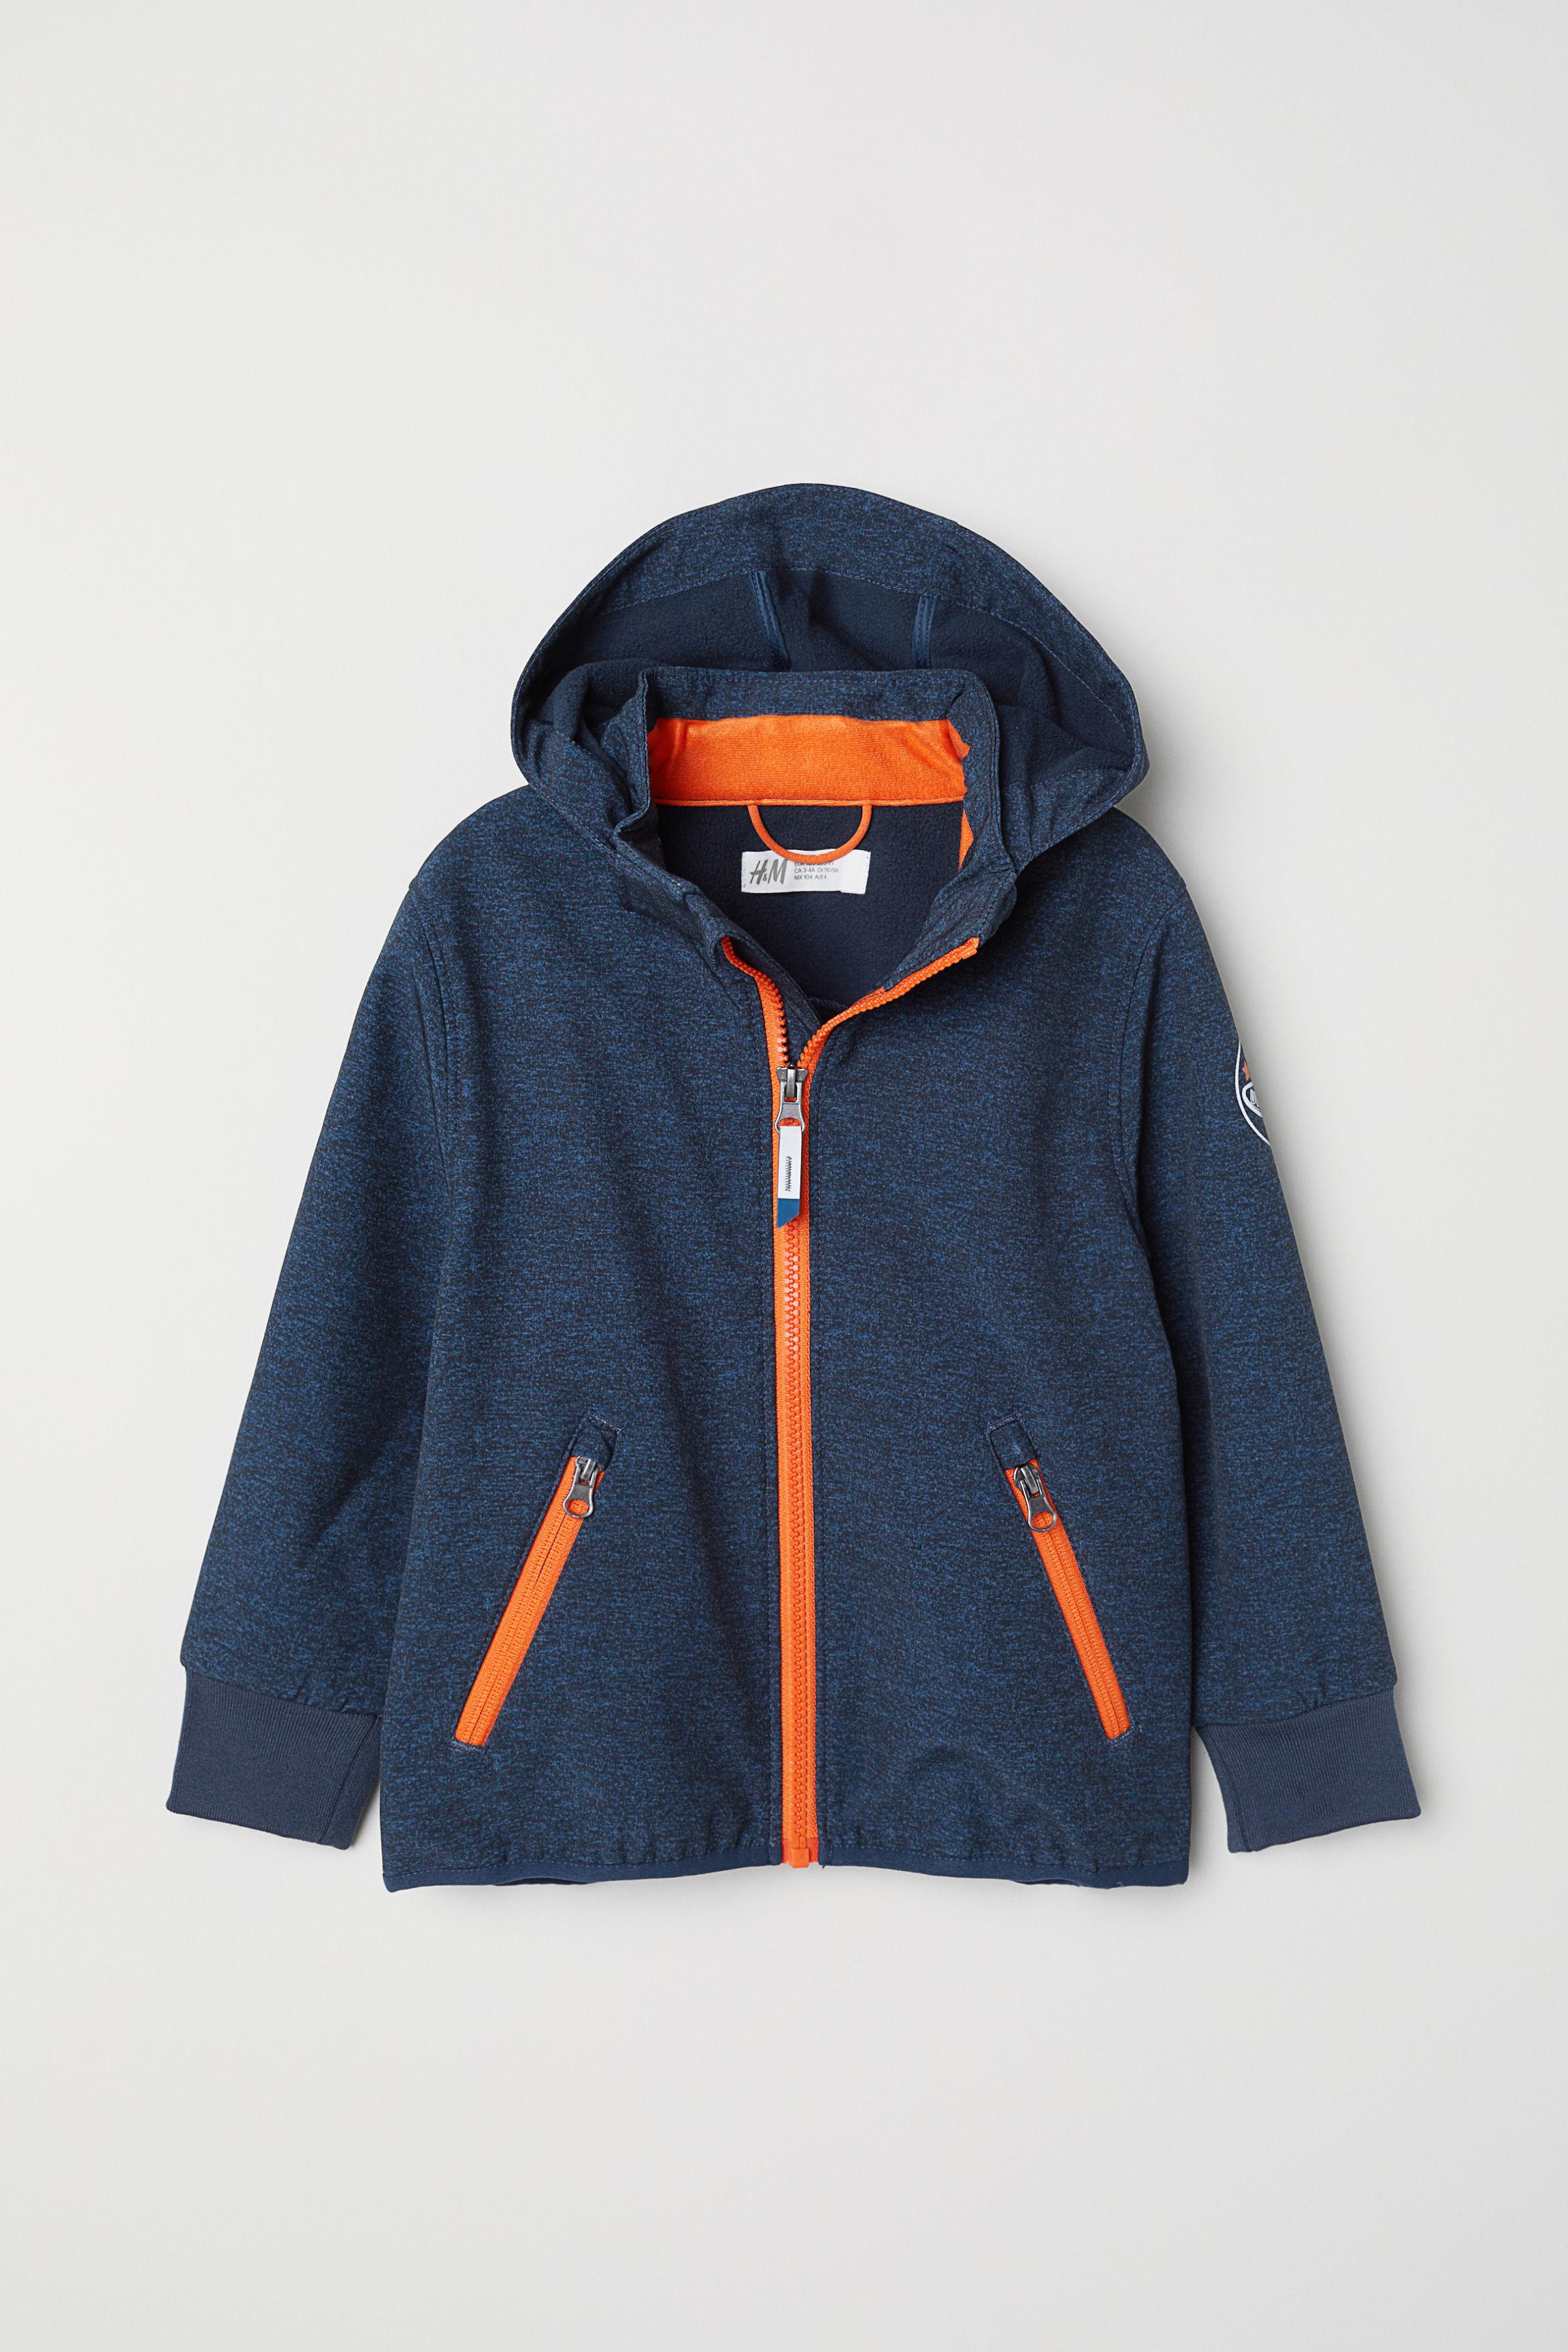 5a807fb398da4 Water-repellent Shell Jacket - Dark blue melange - Kids | H&M US